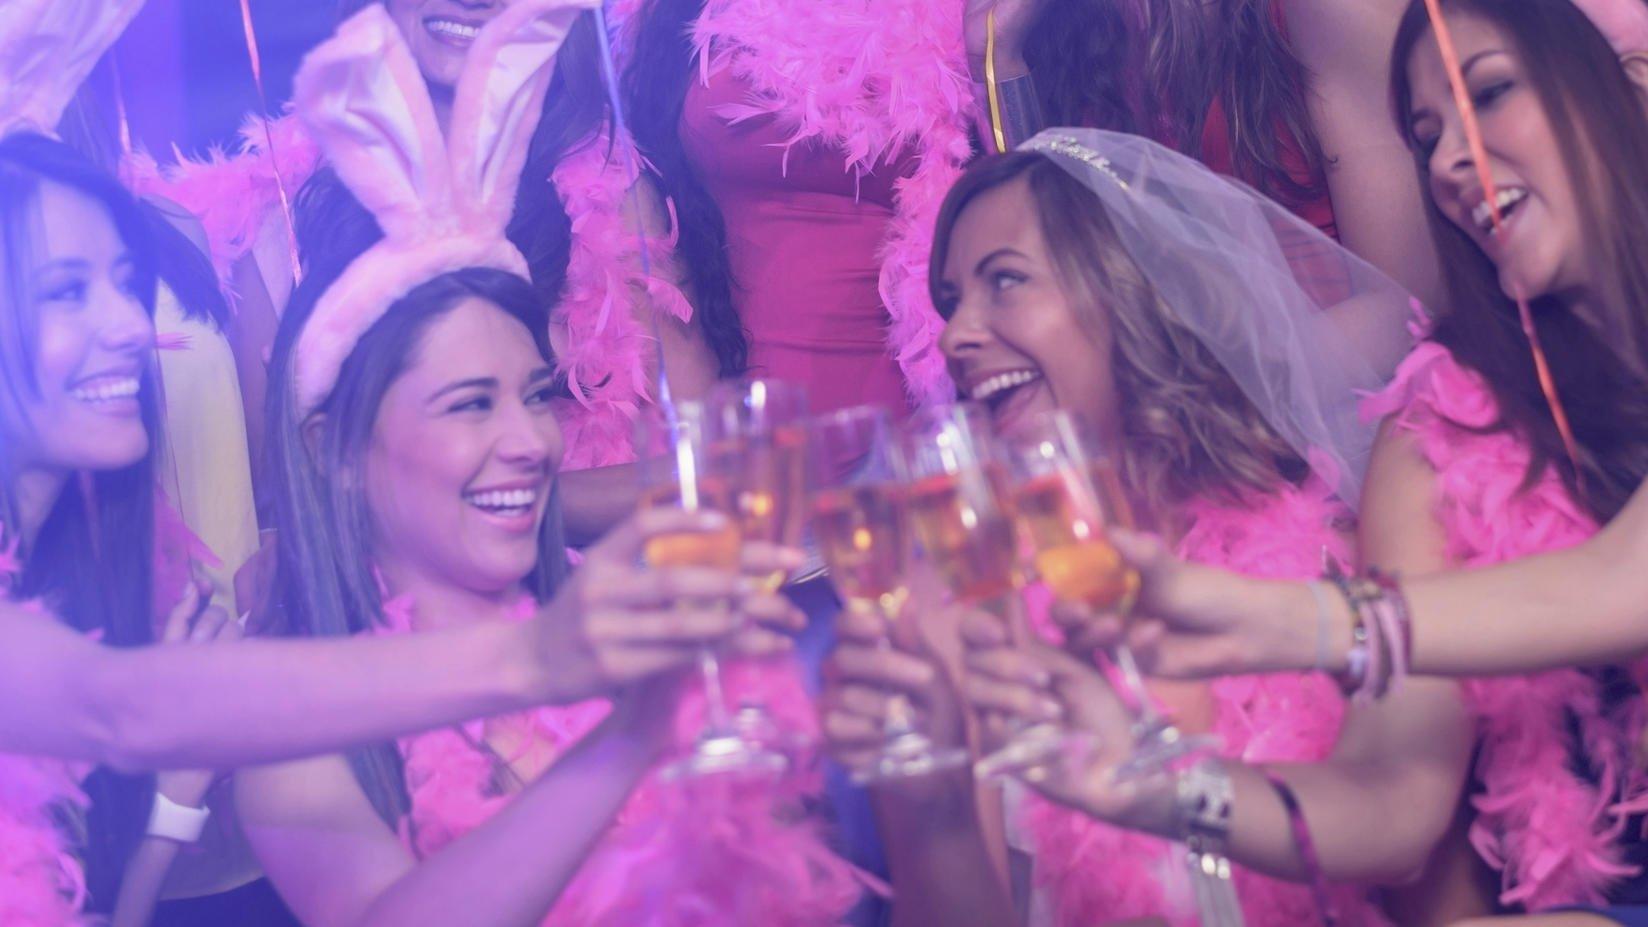 10 Gorgeous Low Key Bachelorette Party Ideas 8 bachelorette party ideas for the low key bride tlcme tlc 2021